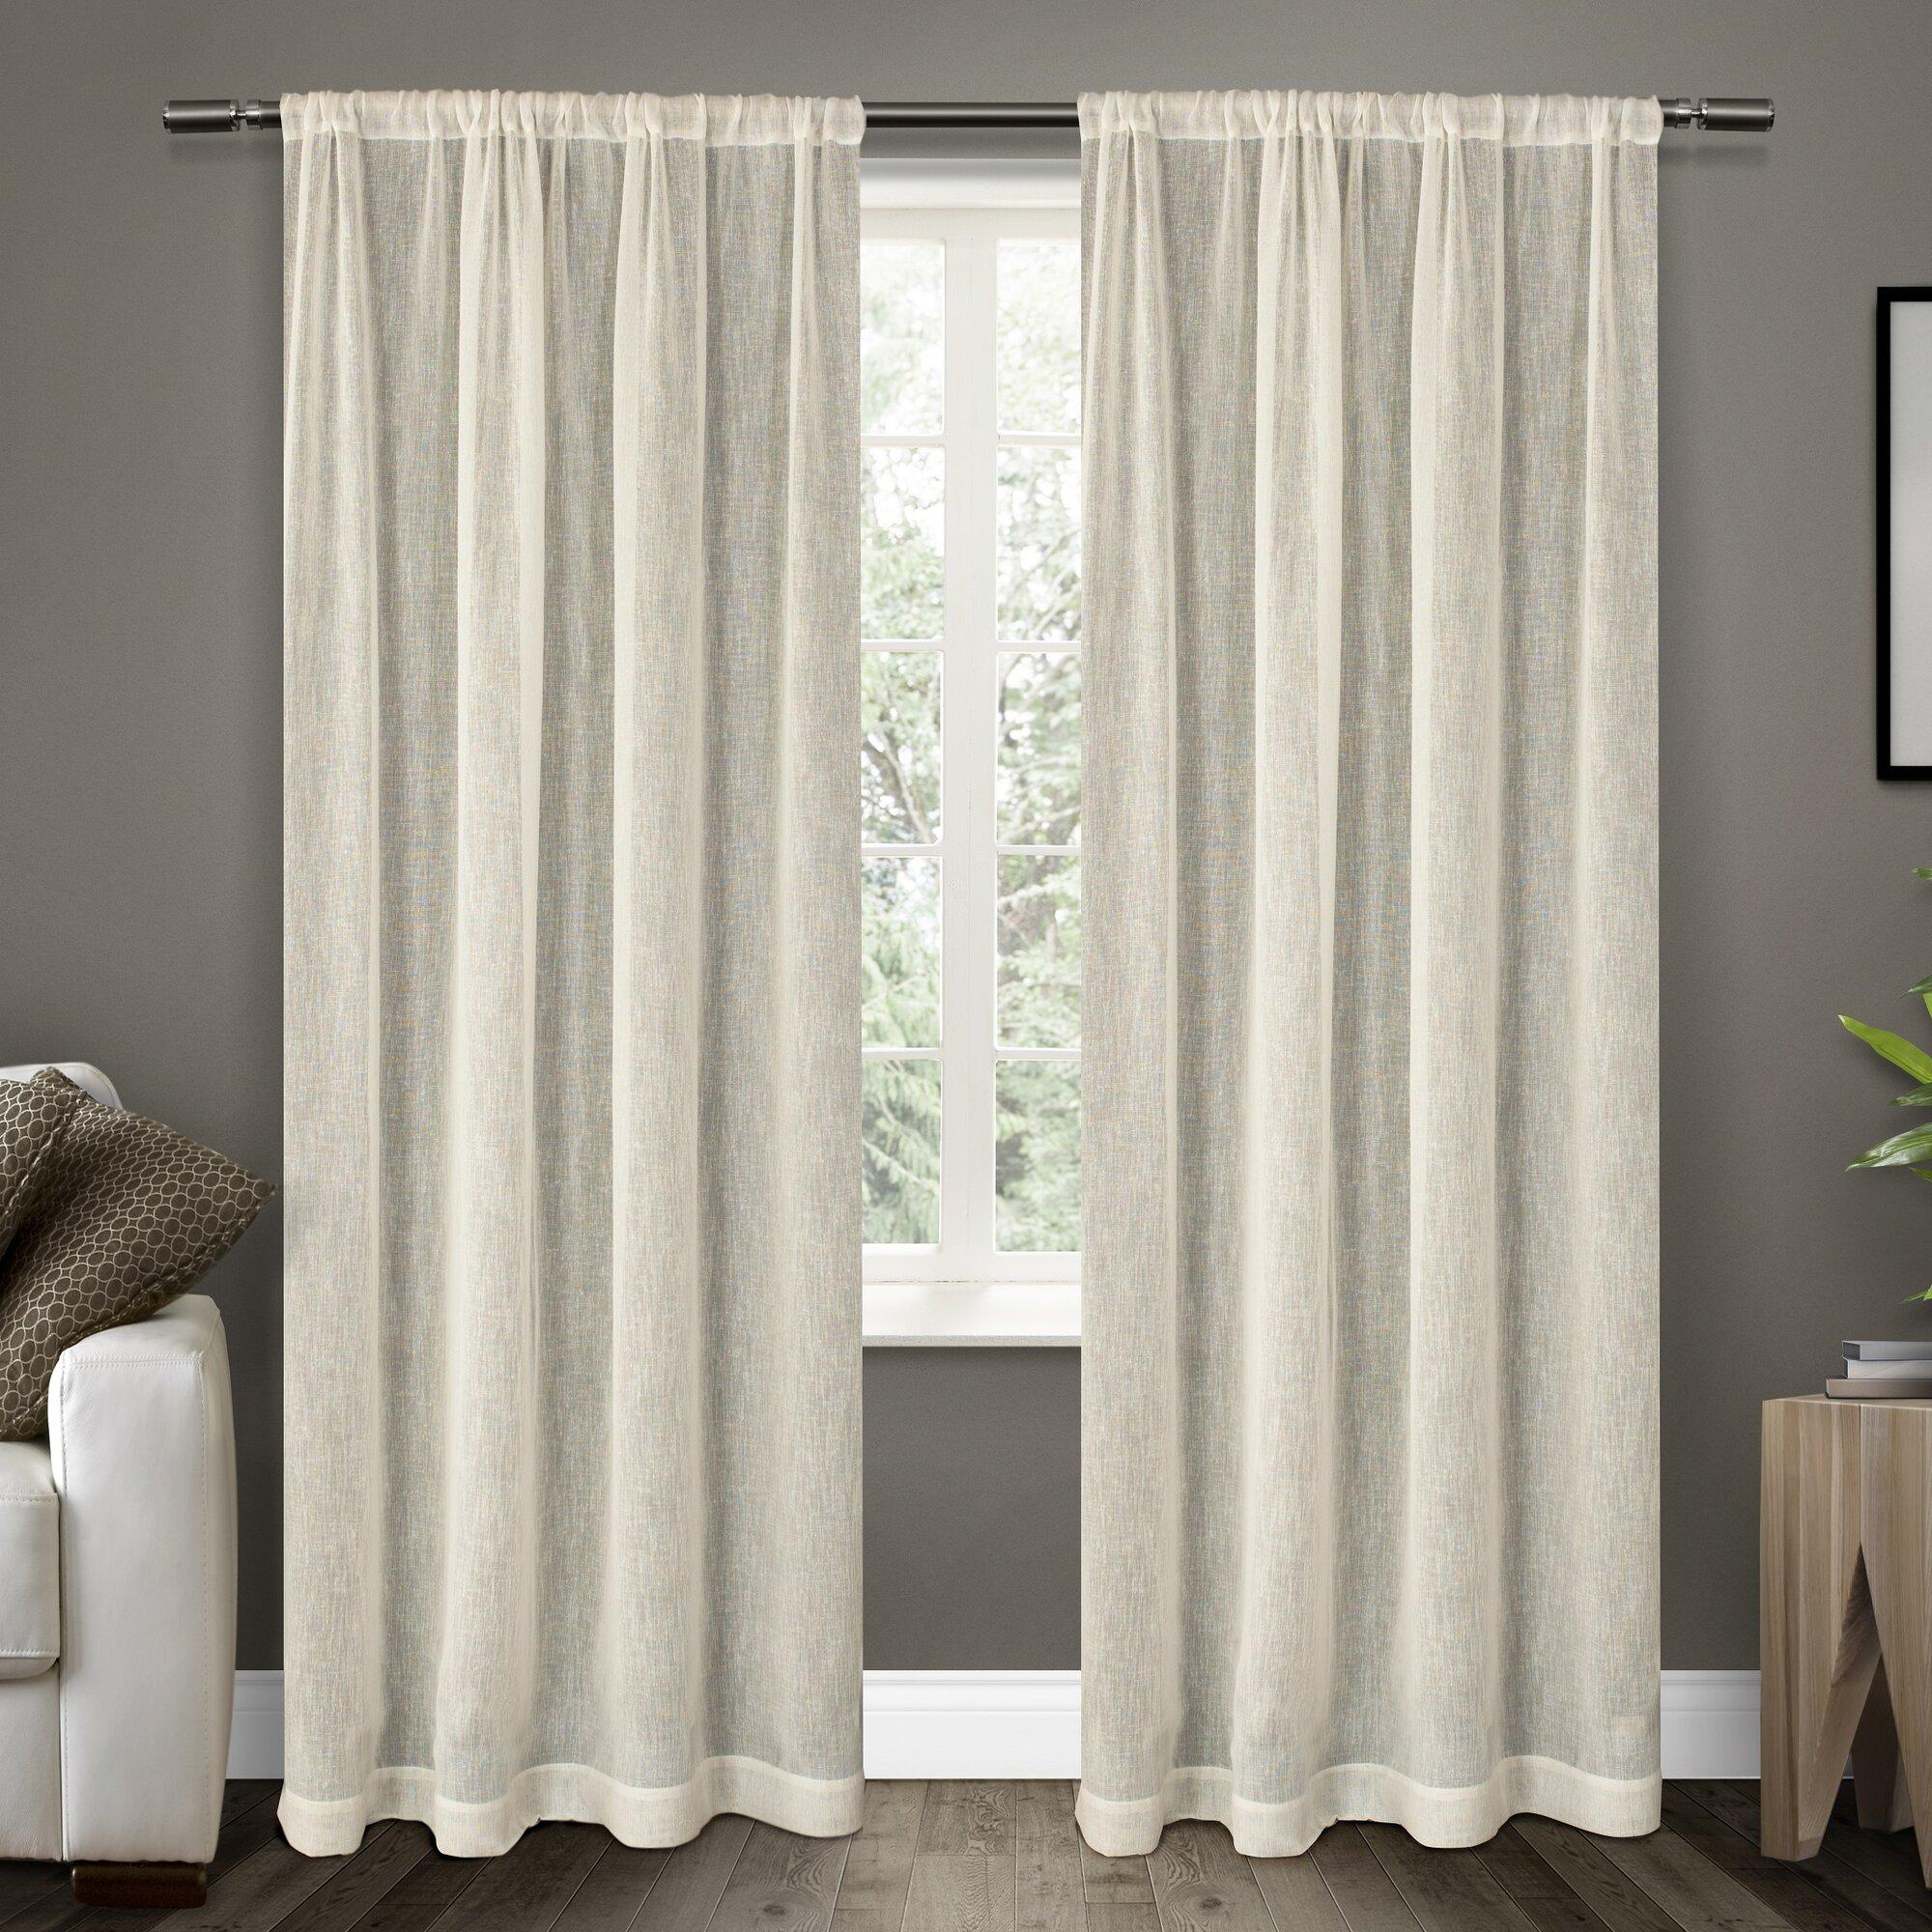 laurel foundry modern farmhouse baillons solid sheer rod pocket curtain panels reviews. Black Bedroom Furniture Sets. Home Design Ideas